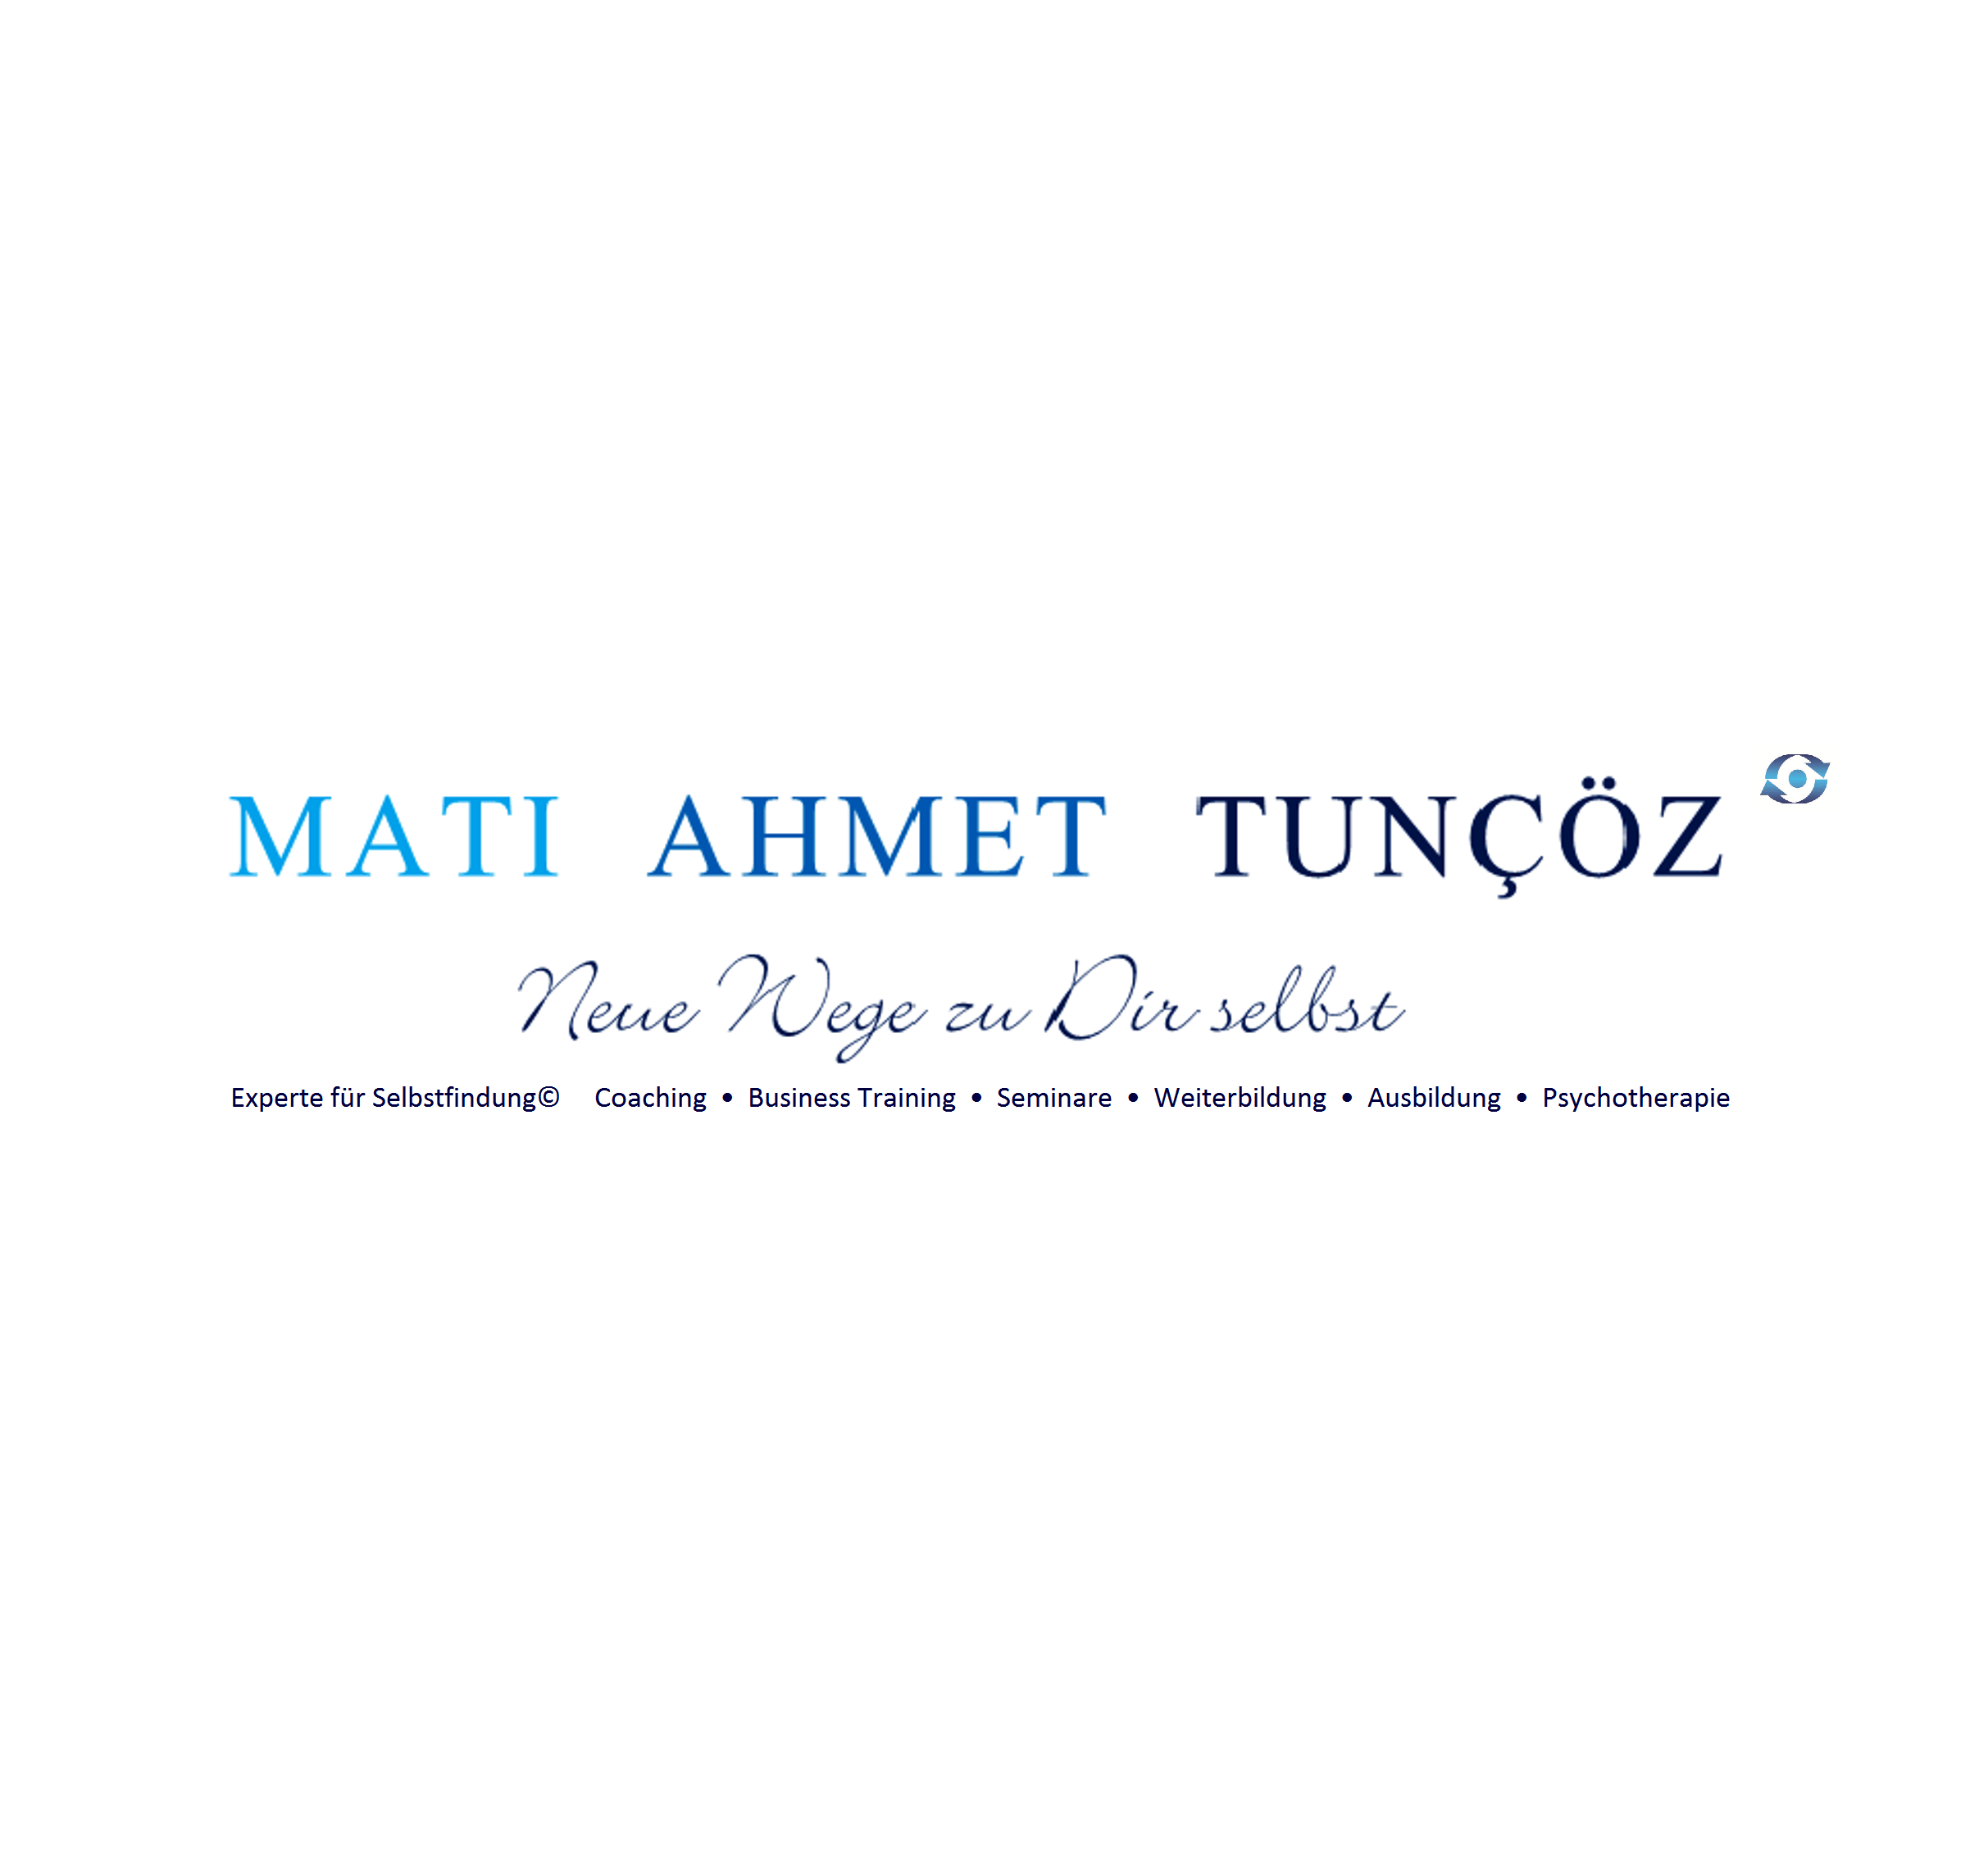 Mati Ahmet Tunçöz - Coaching Ausbildung Psychotherapie Training Selbstfindung